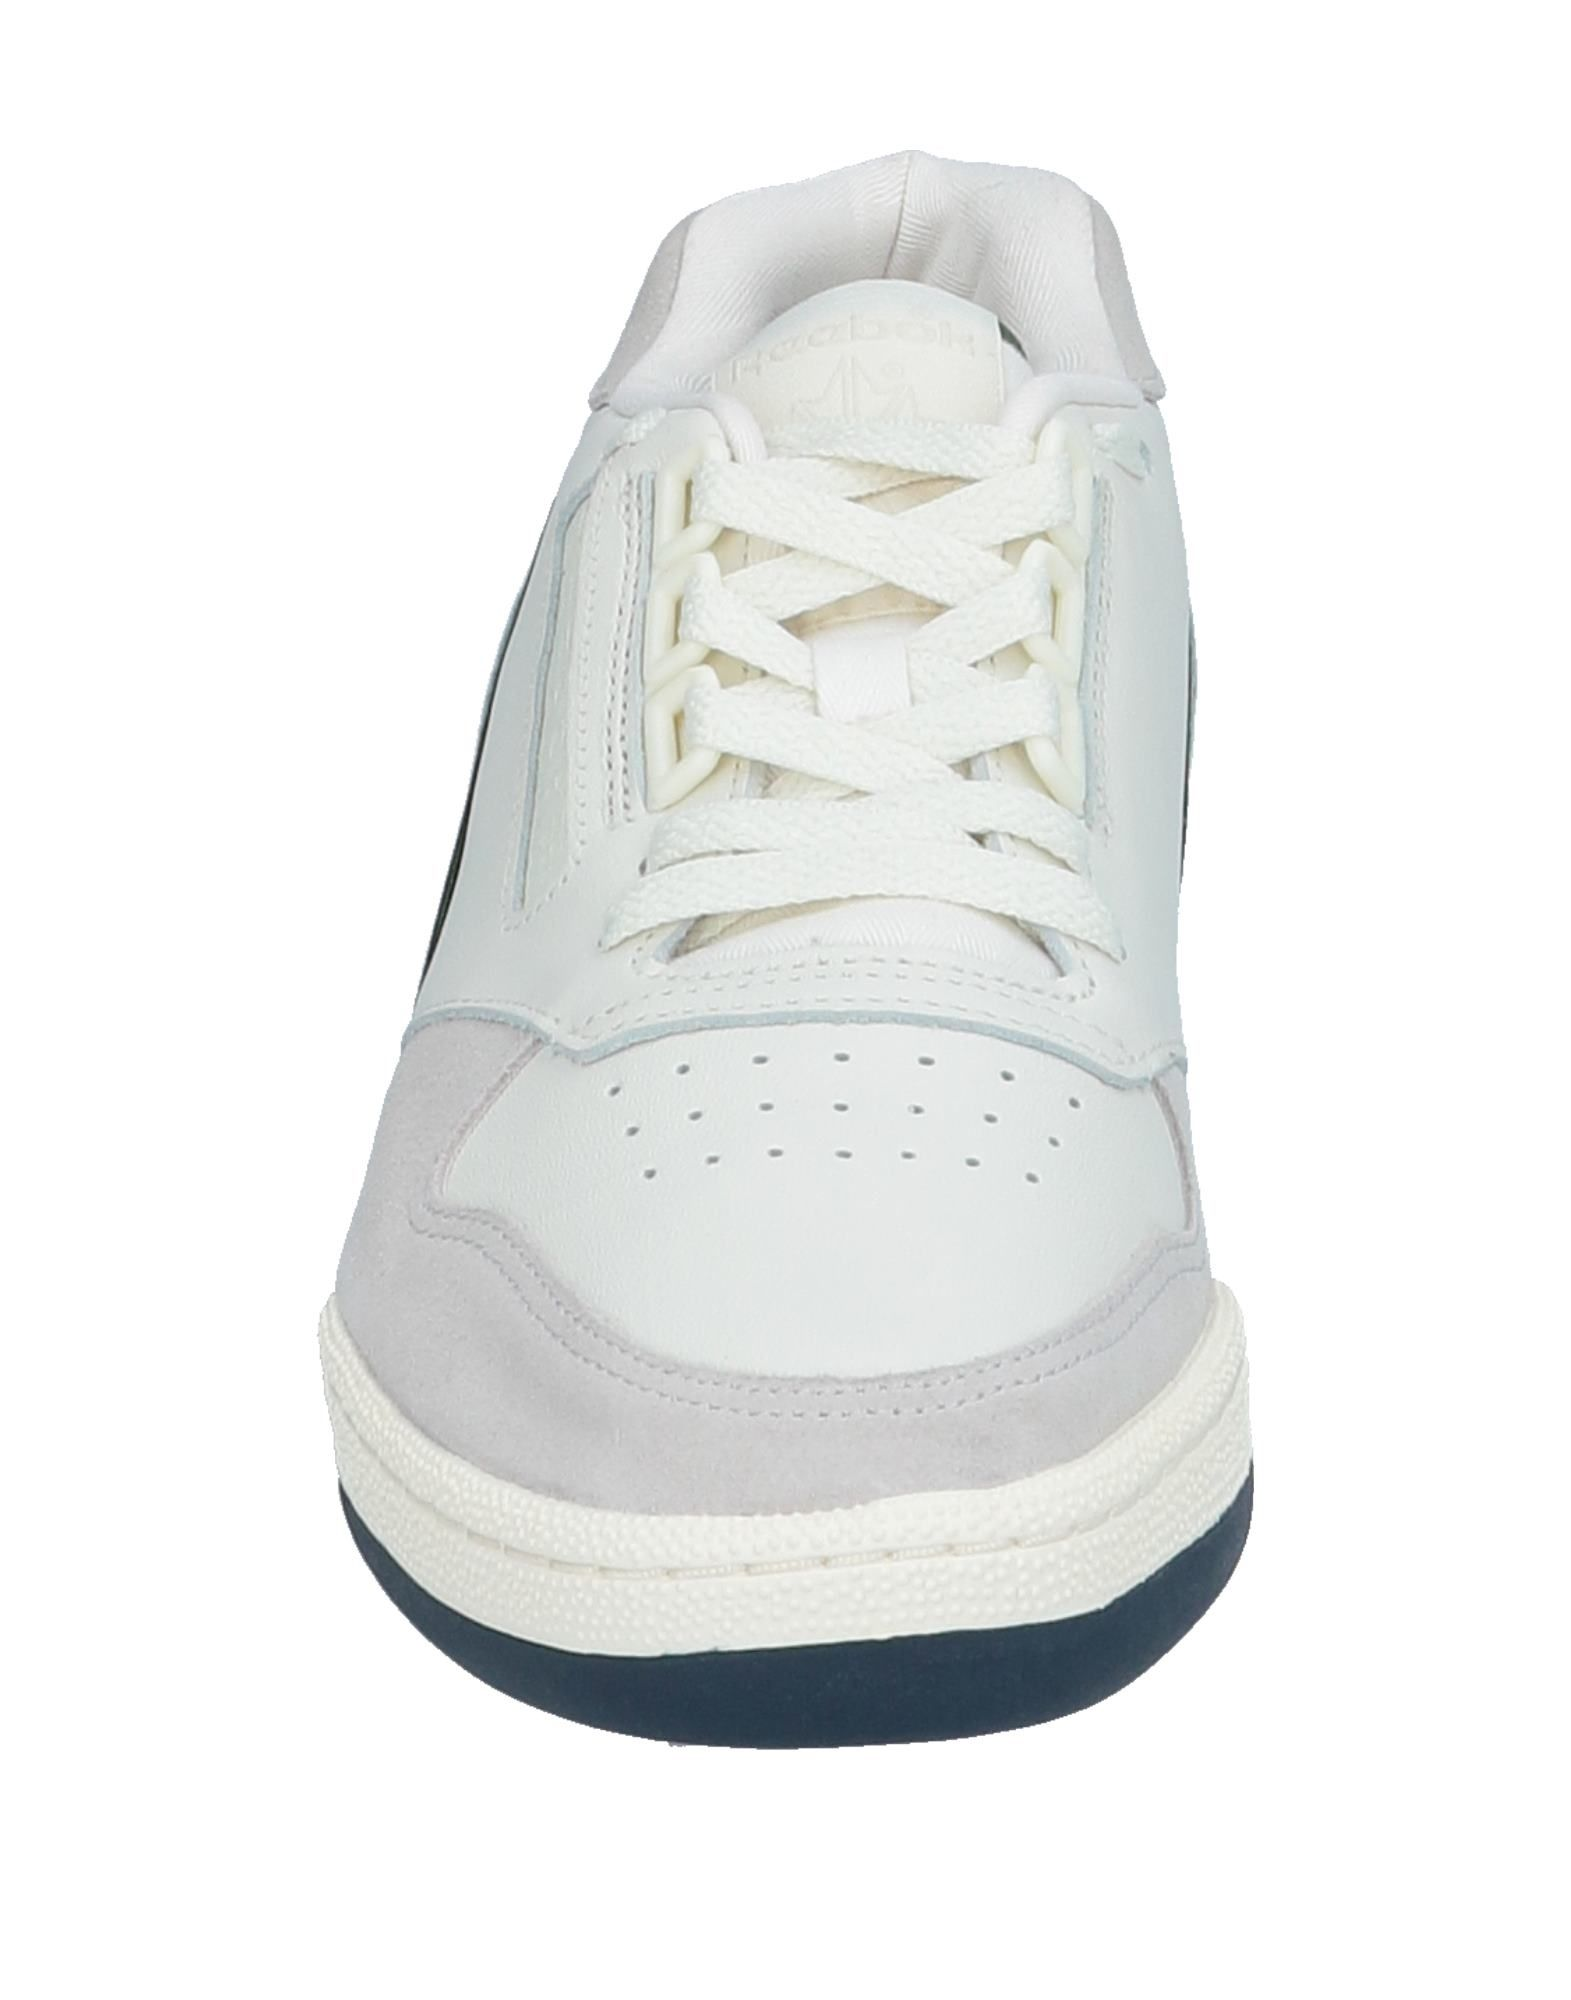 Rabatt Reebok echte Schuhe Reebok Rabatt Sneakers Herren  11532933CI a64f2f